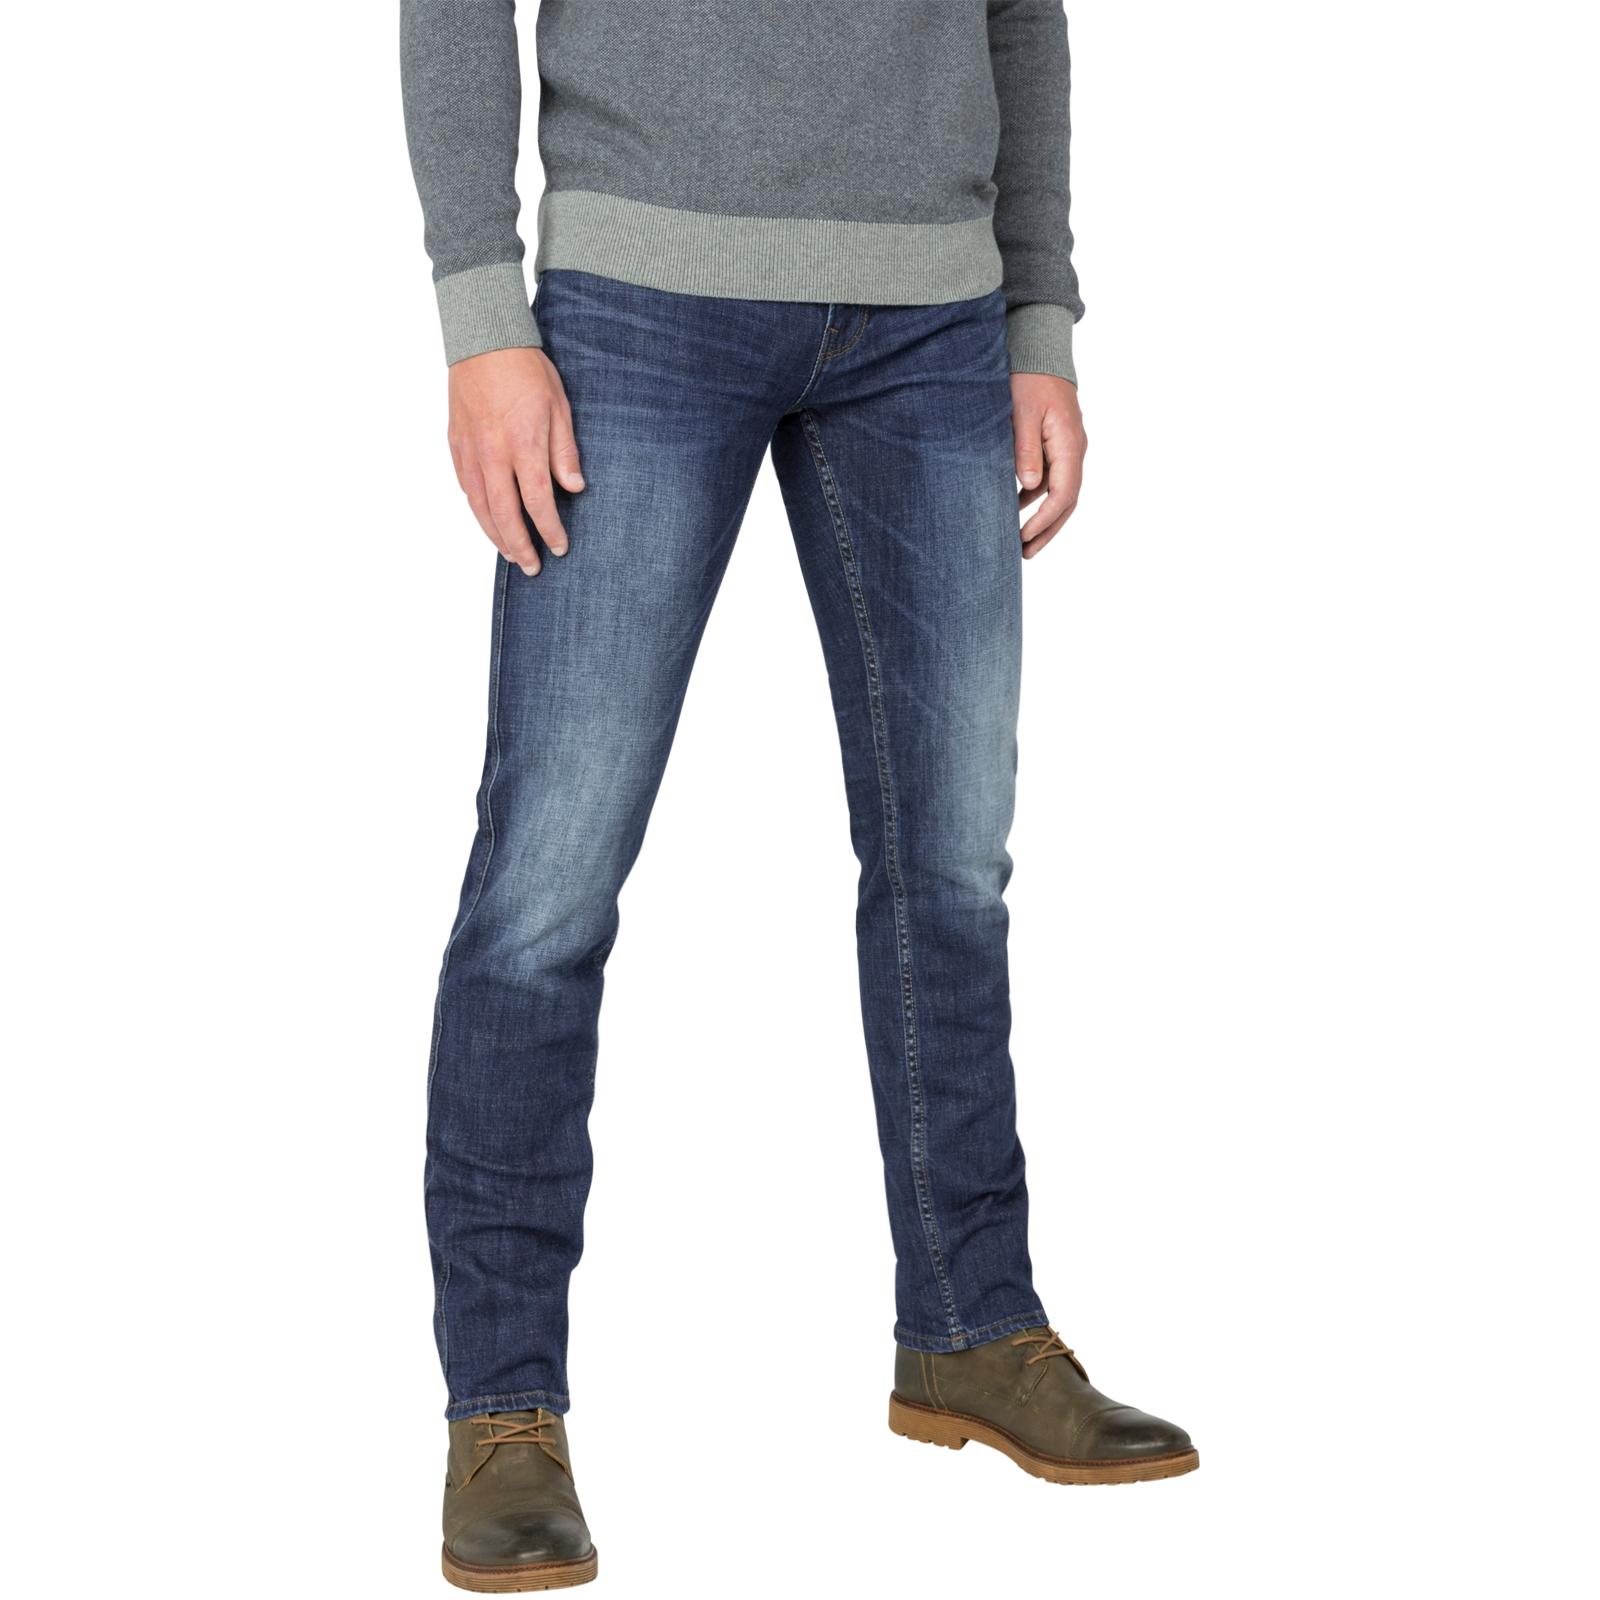 PME Legend Jeans Nightflight MVB